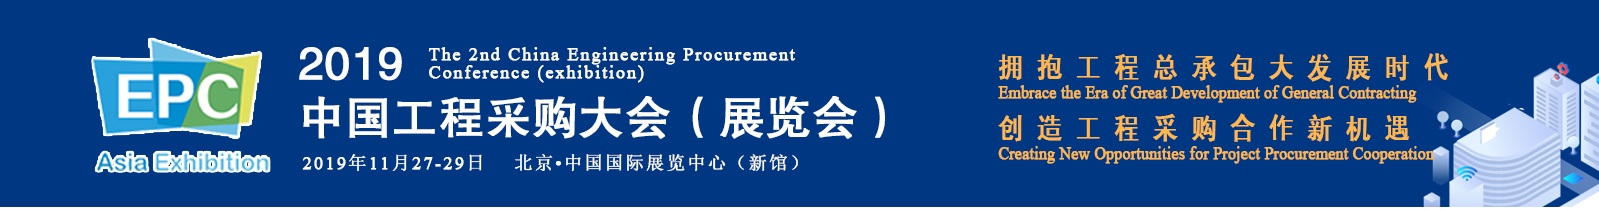 大屏logo